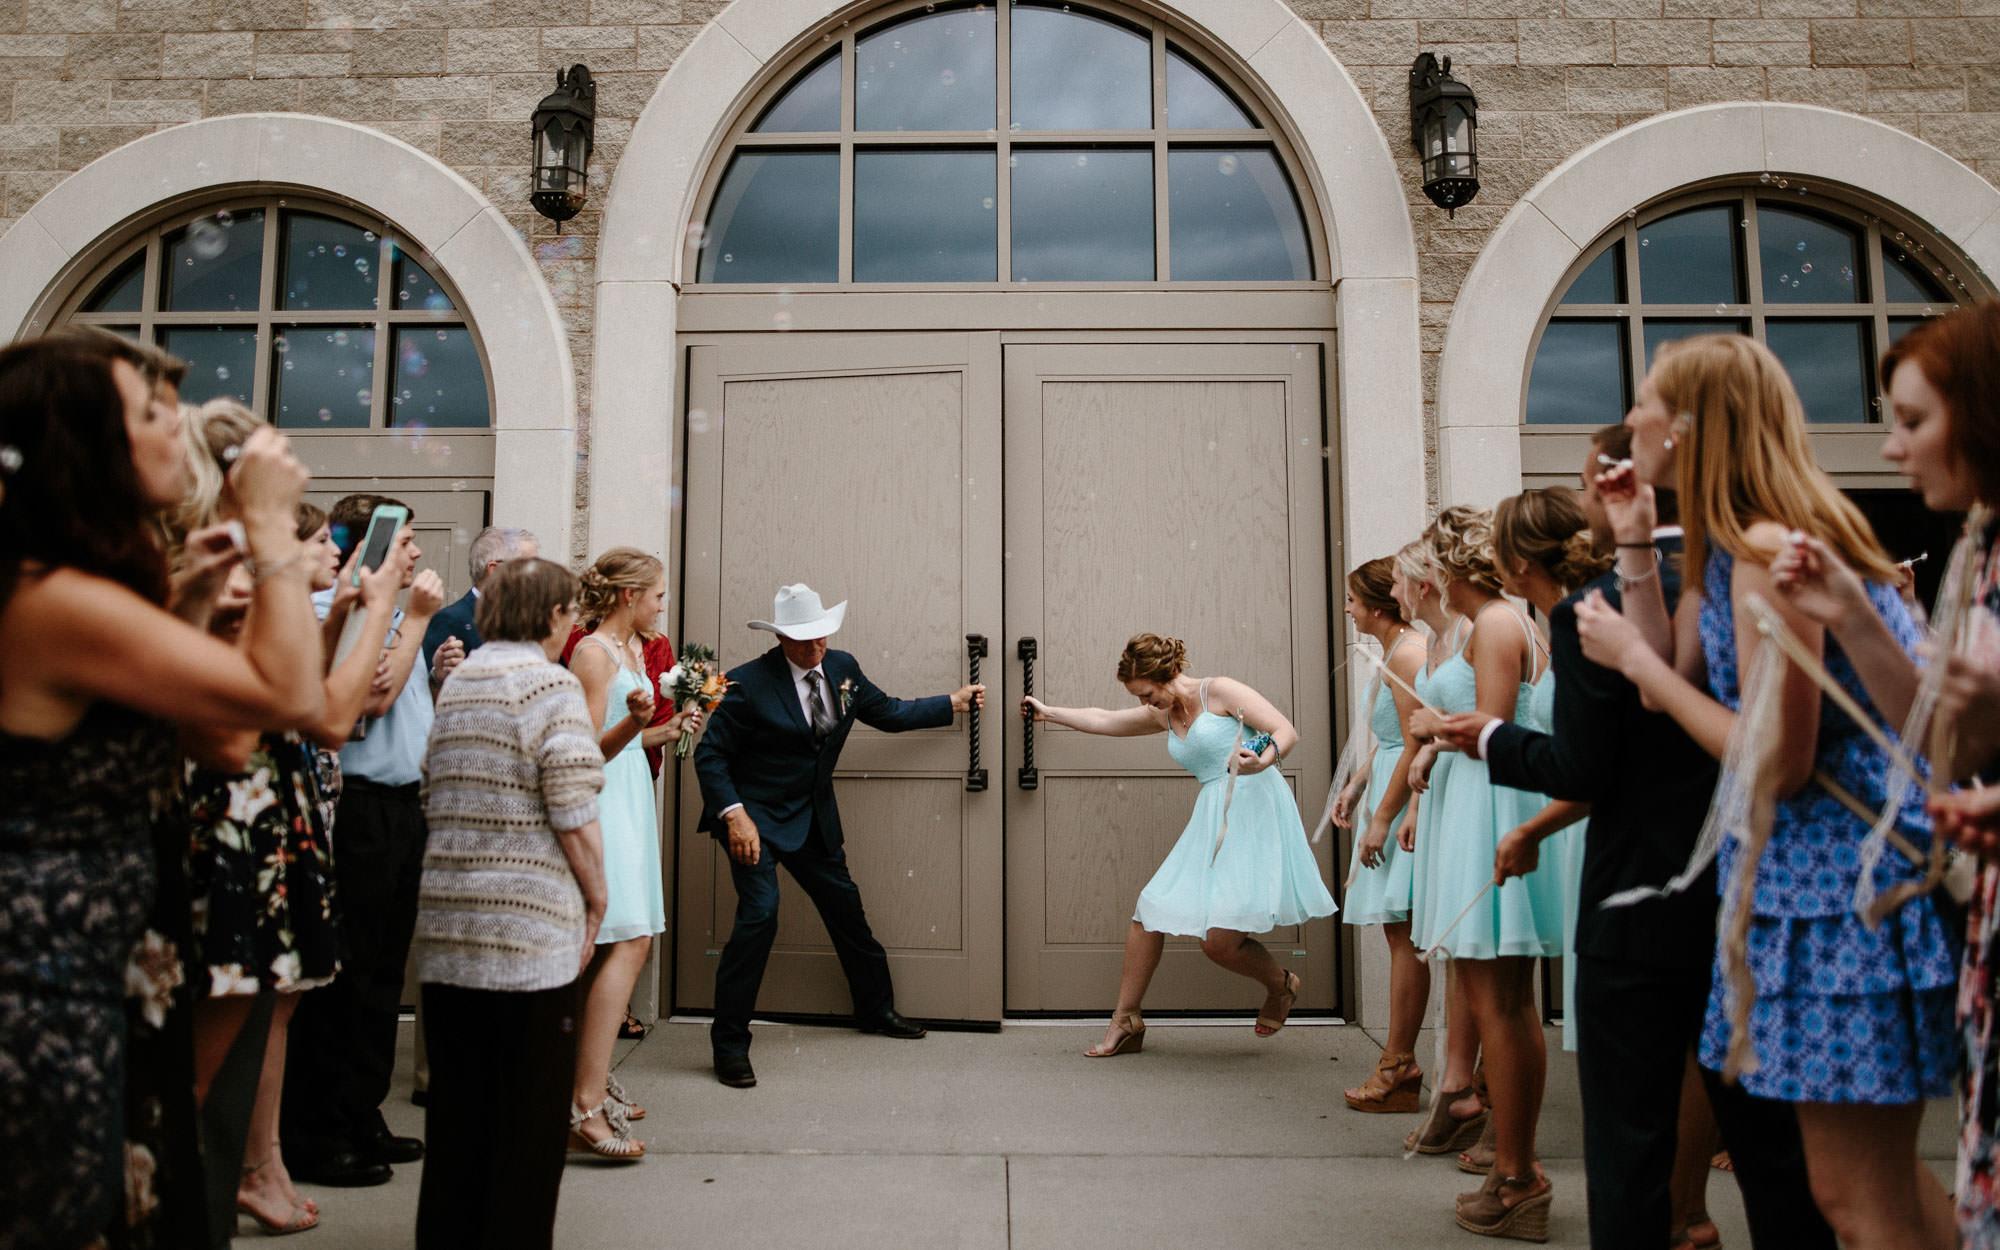 meadow-barn-wedding-sioux-falls-south-dakota-romantic-adventerous-michael-liedtke-photography035.jpg